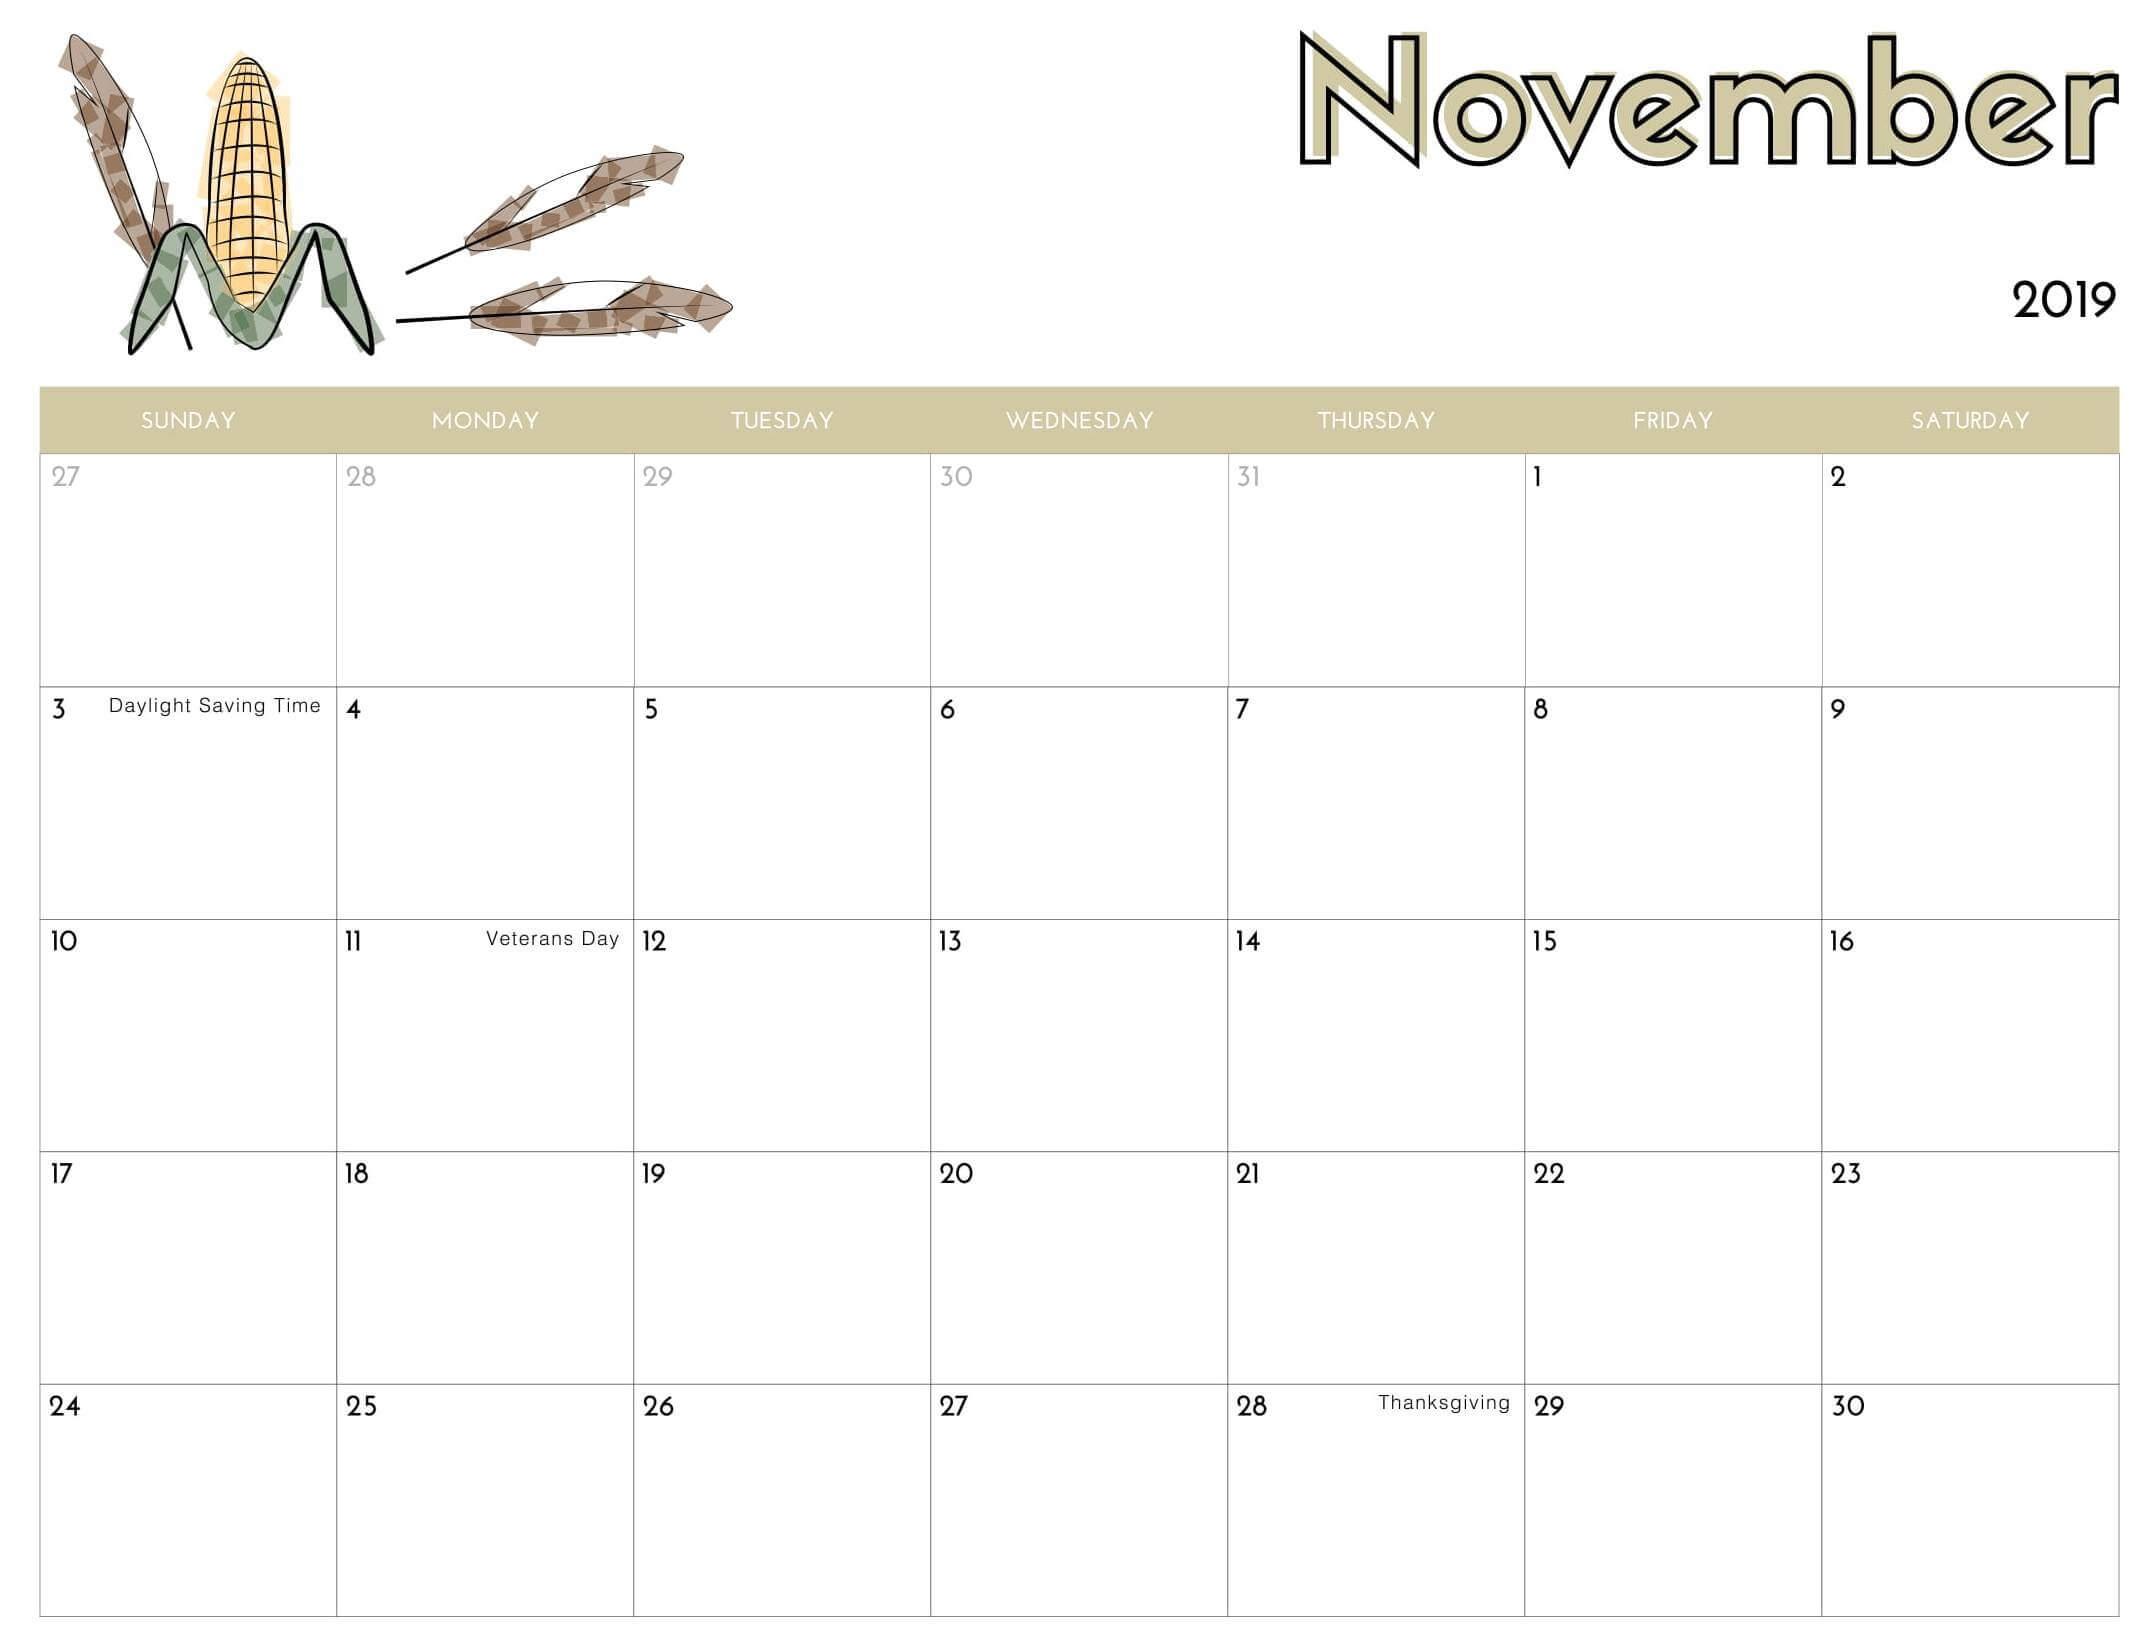 November 2019 Calendar Printable Images